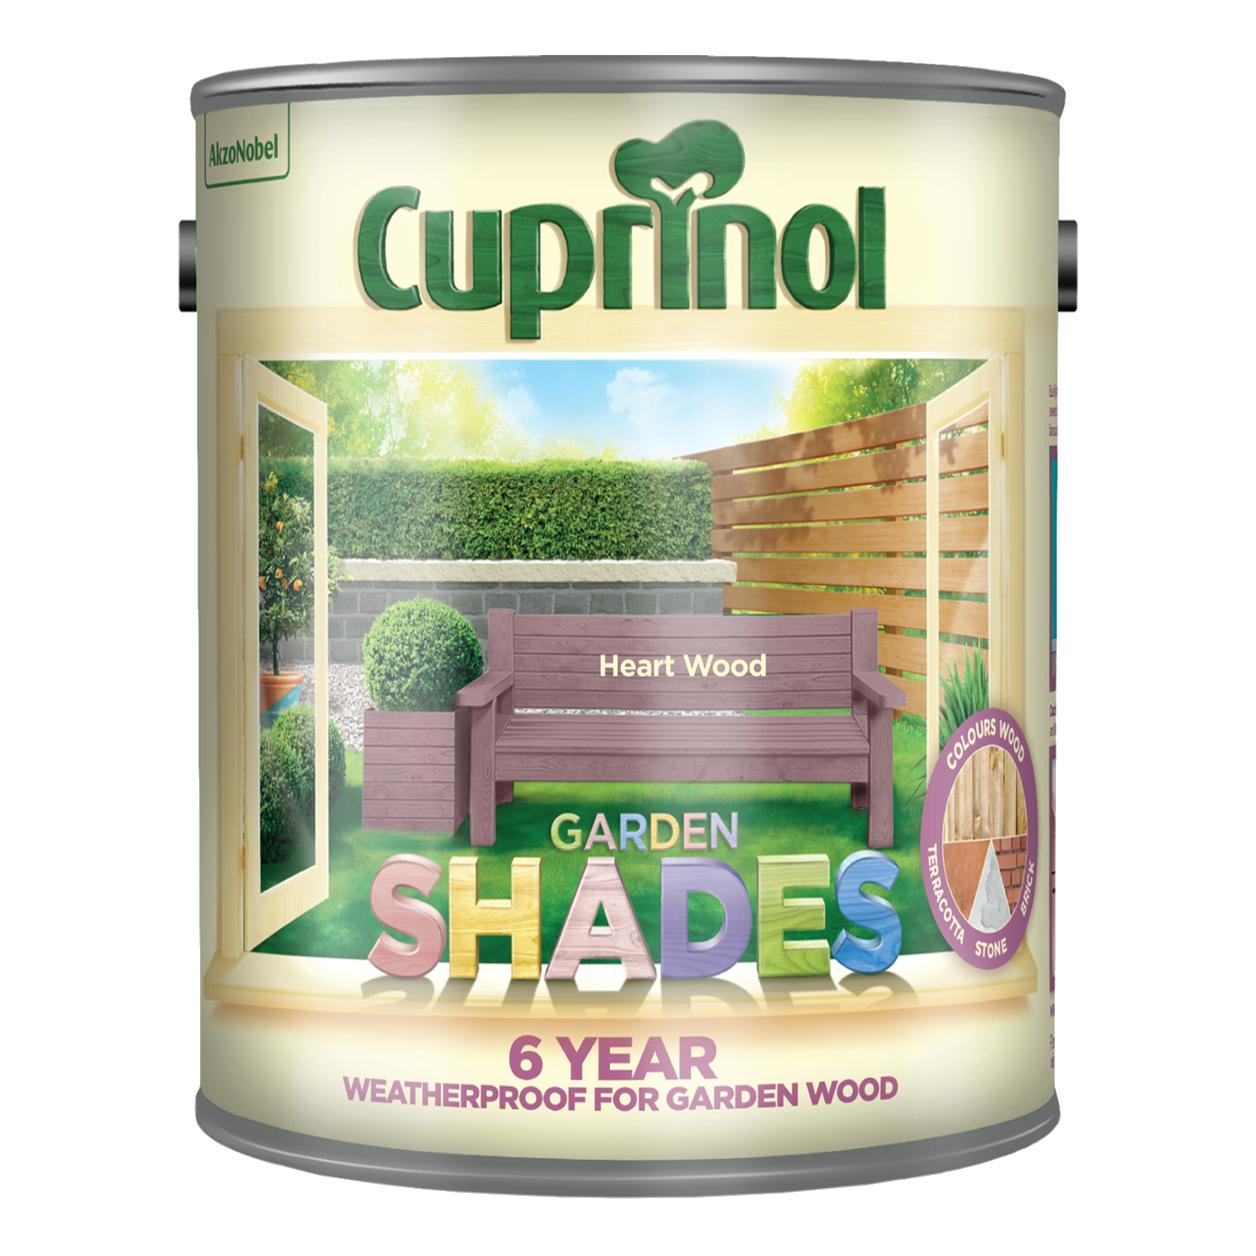 2.5L Cuprinol Garden Shades £16.79 (£6.25 delivery / free over £20) @ Dulux Shop